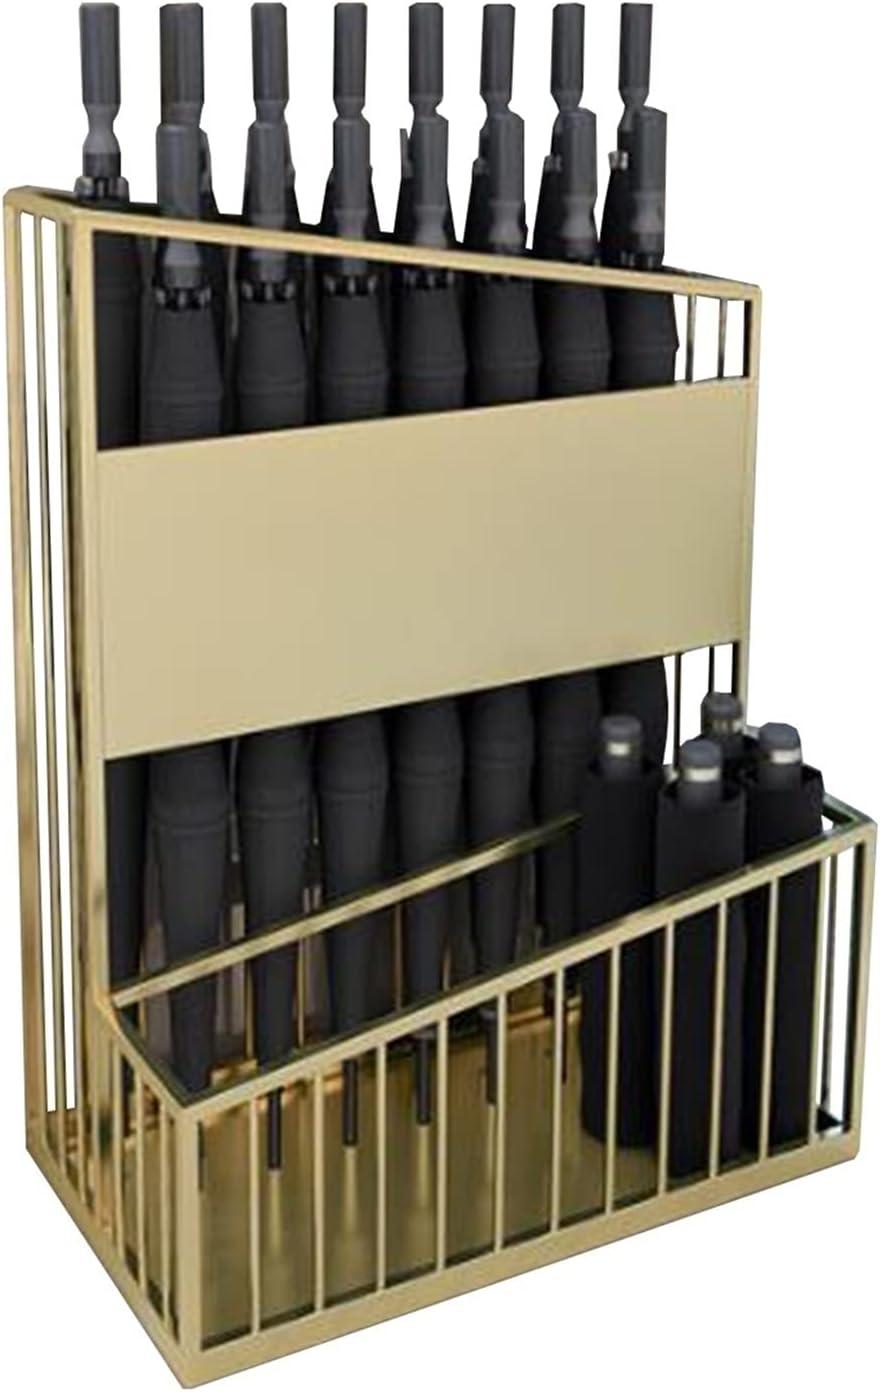 Umbrella Racks Gold Max 66% OFF overseas Stand Commercial HolderïÂ